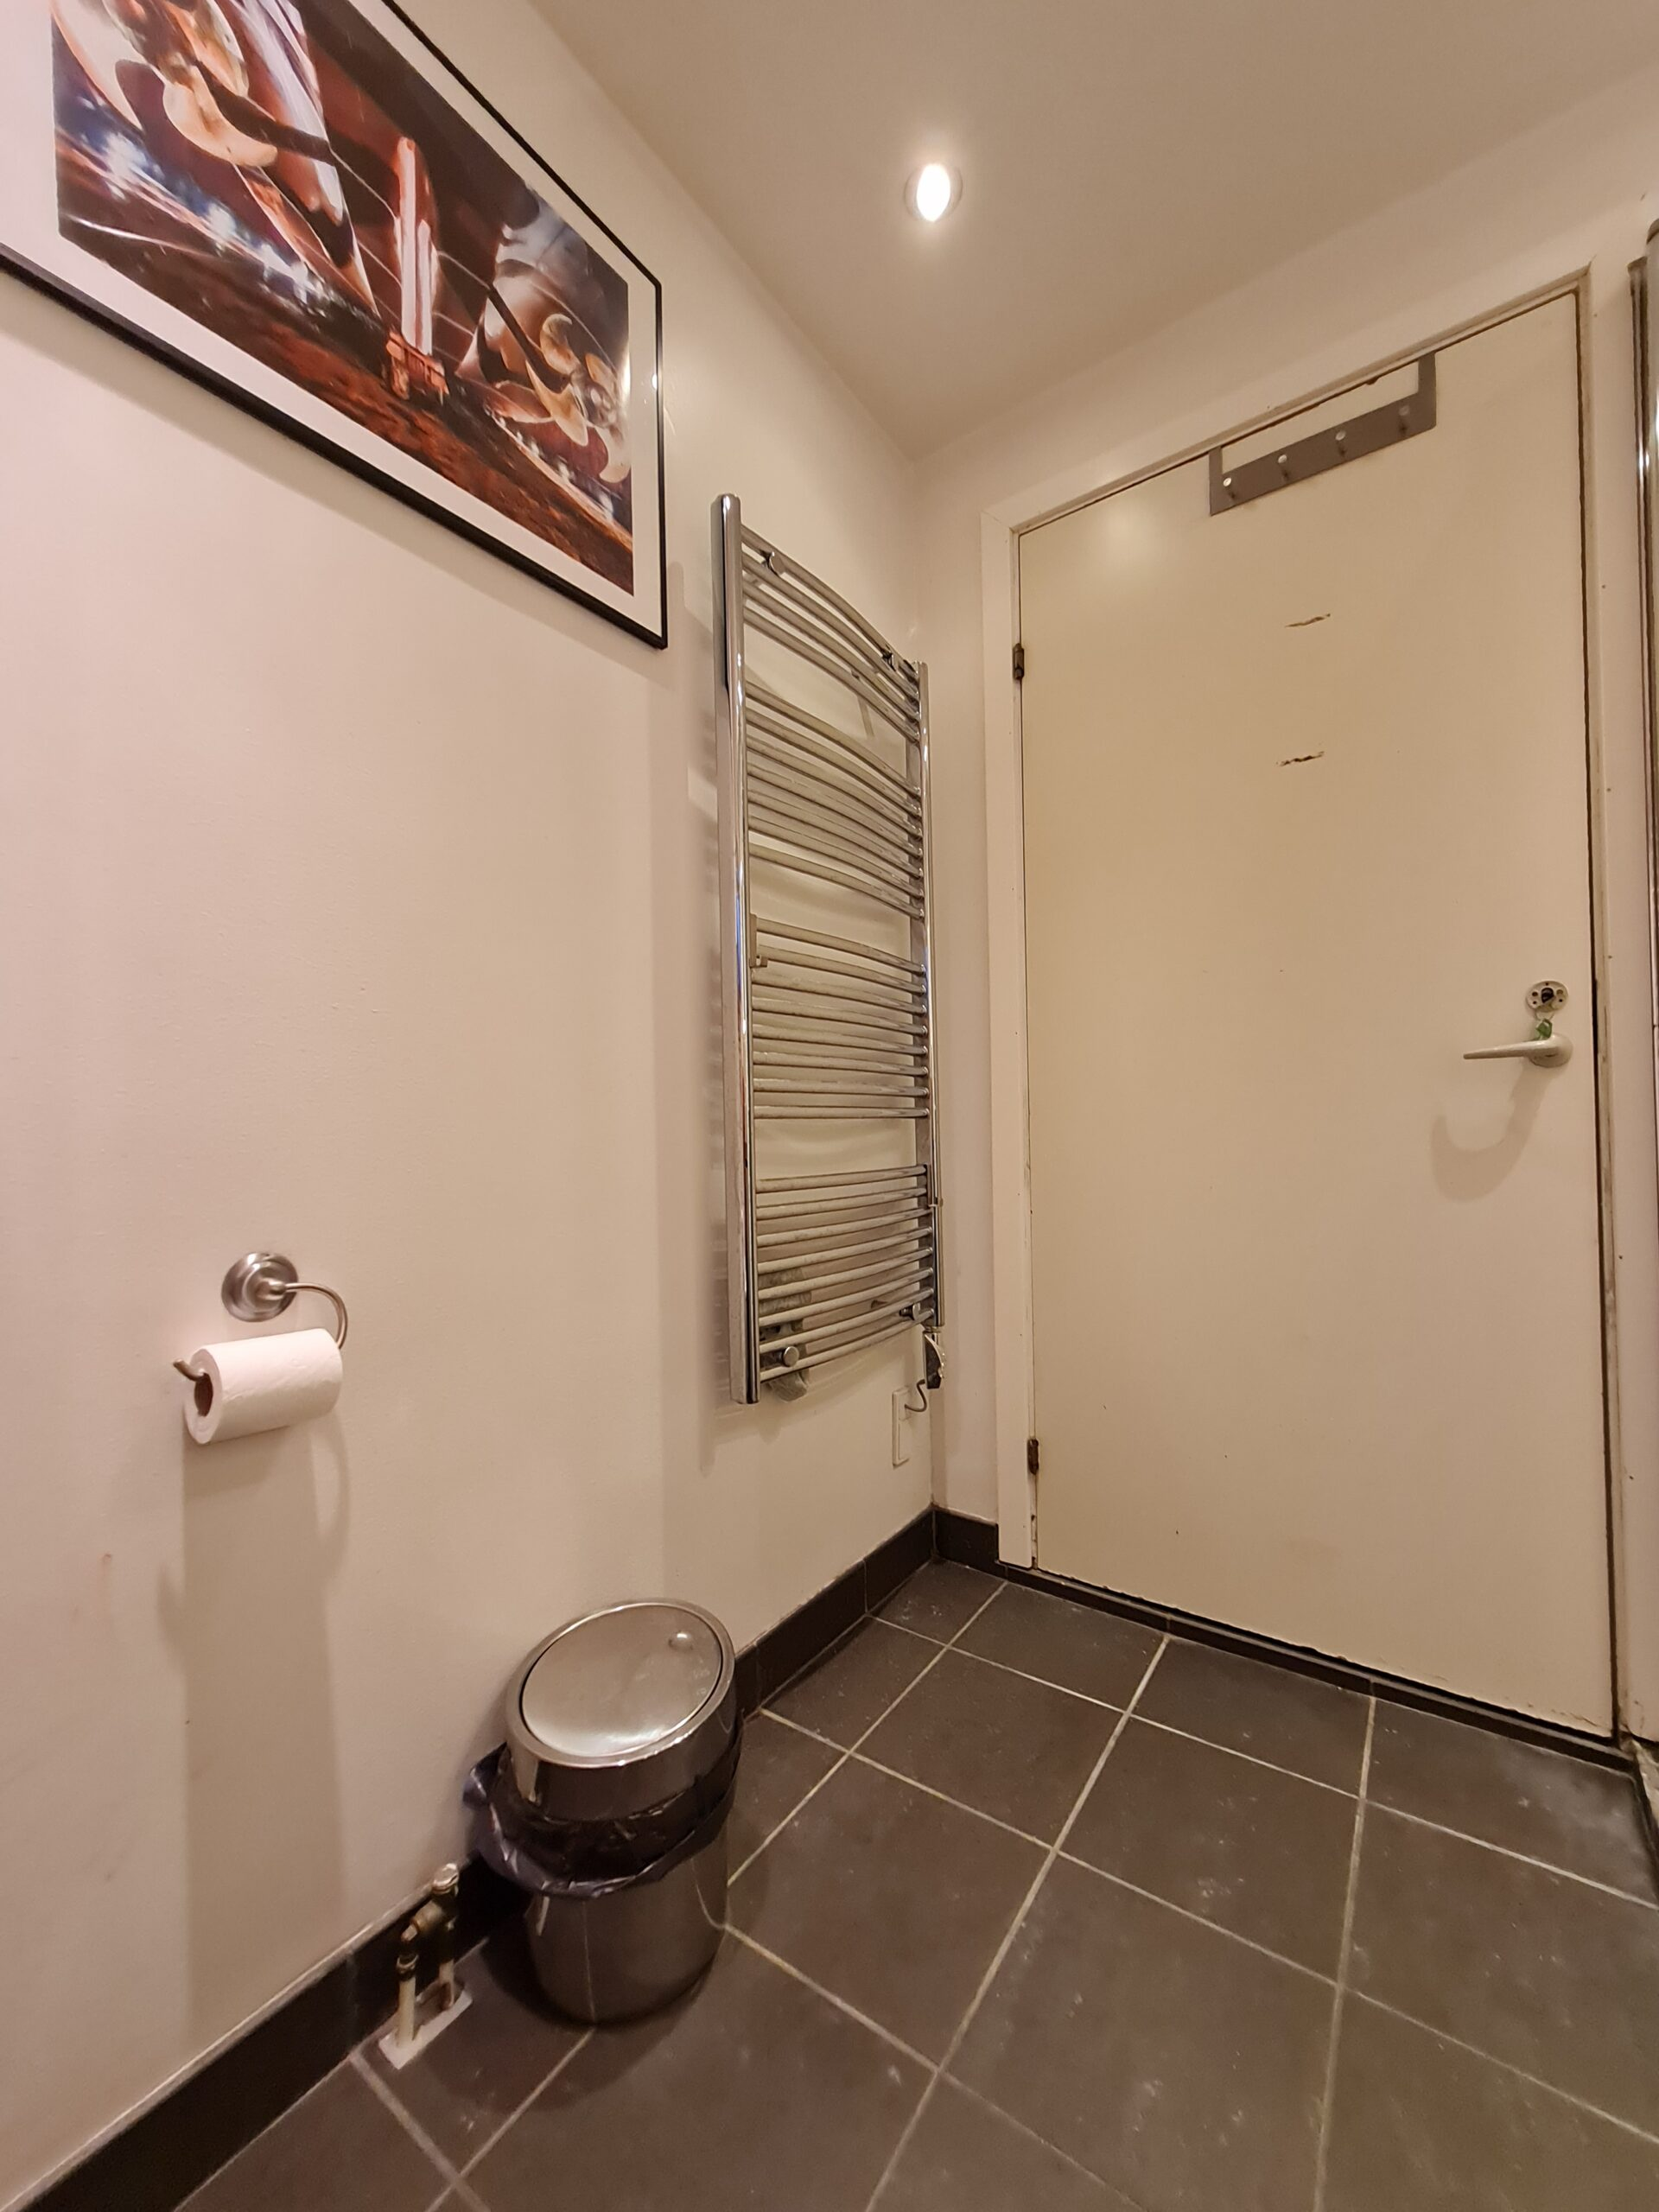 Toilet-2-96